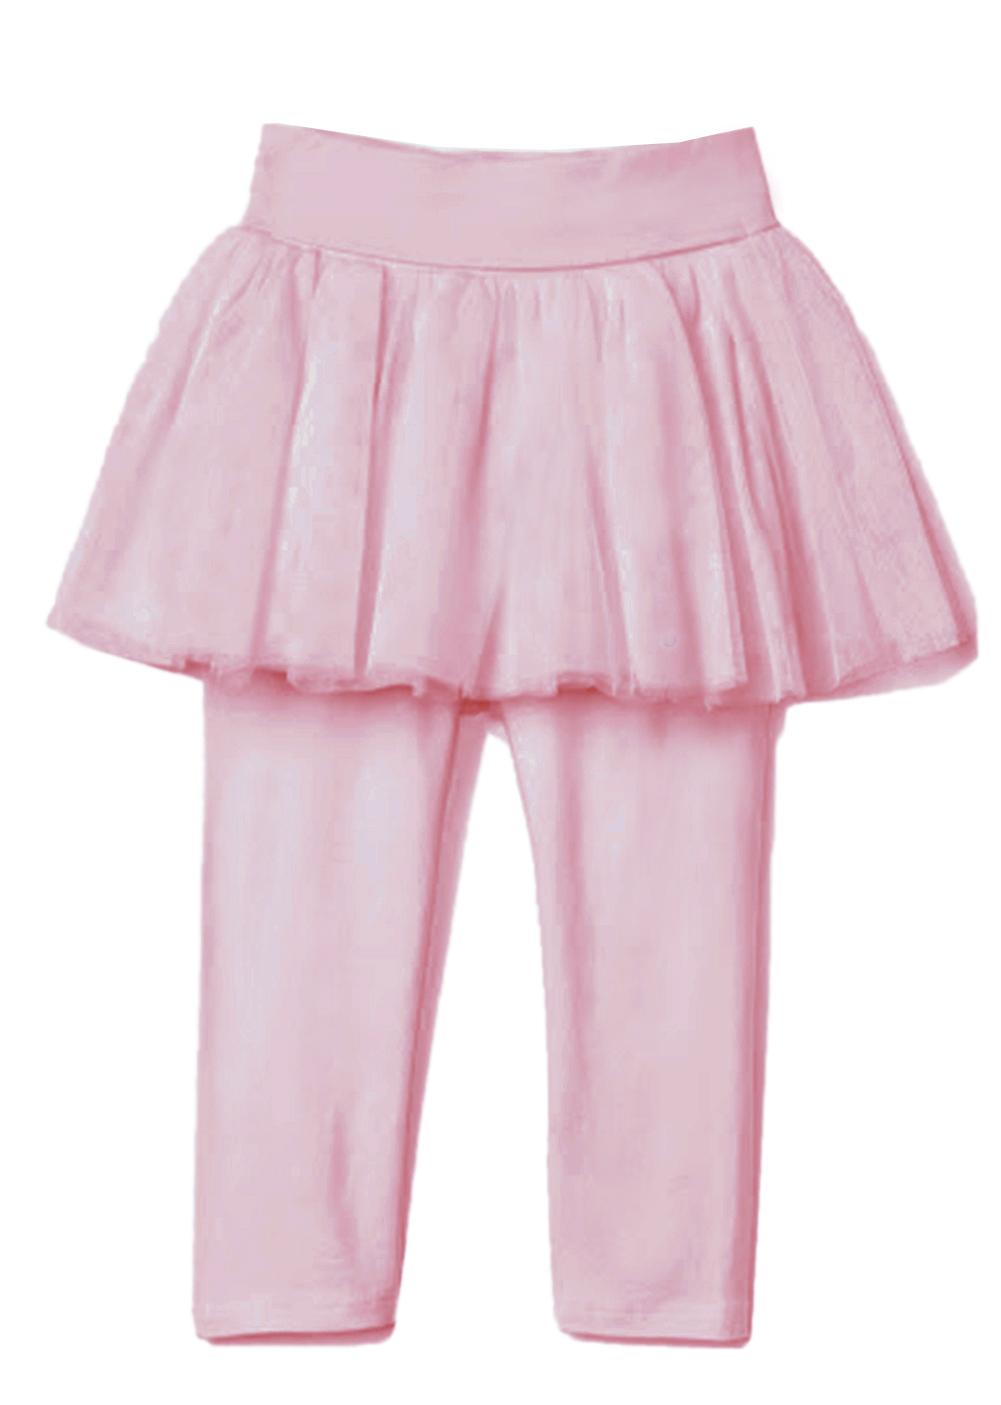 StylesILove Toddler Girl Soft Tutu Cotton Legging Pants (90/3T, Yellow)